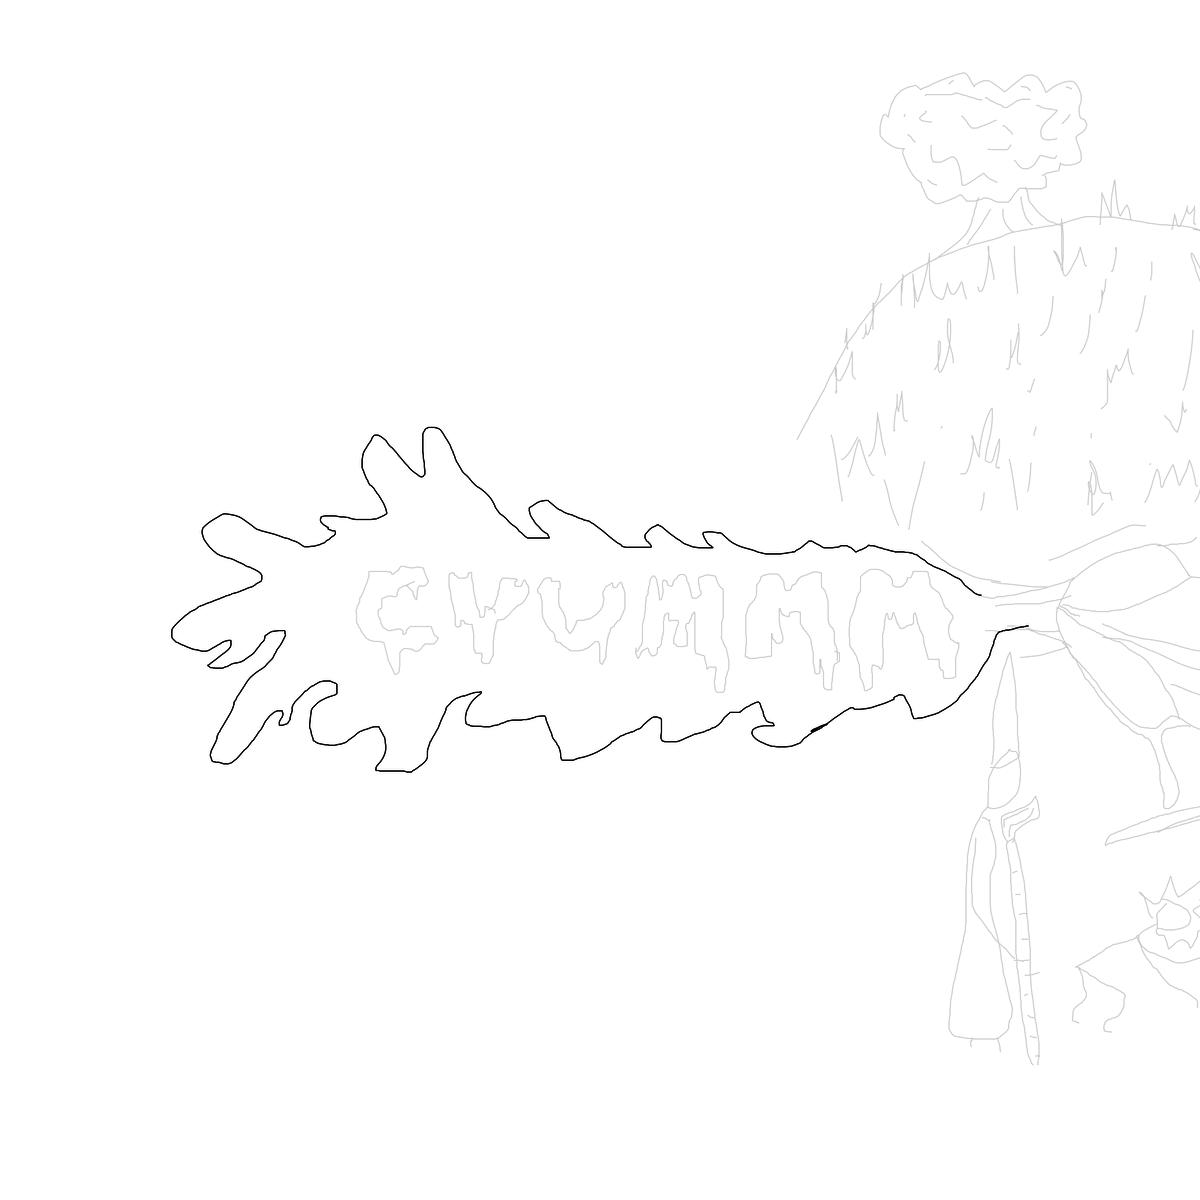 BAAAM drawing#23957 lat:78.4174575805664000lng: -4.4295139312744140